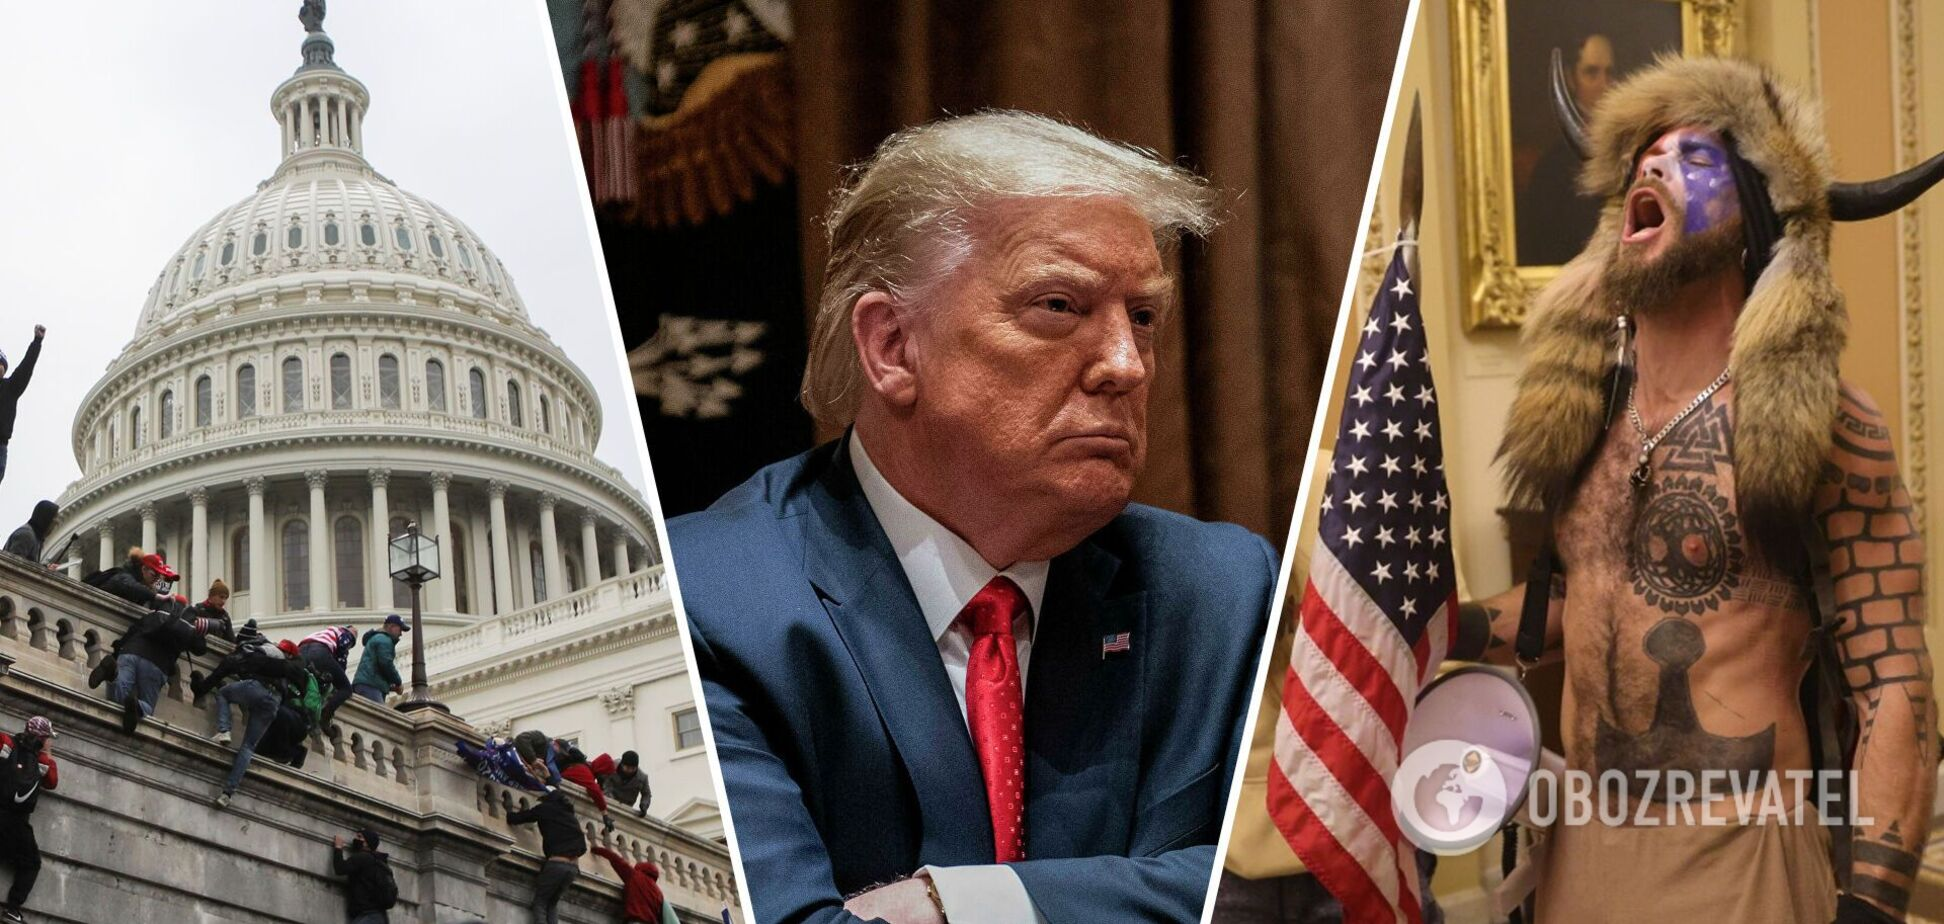 Імпічмент Дональда Трампа й штурм Капітолію: як США опинилися на межі краху демократії